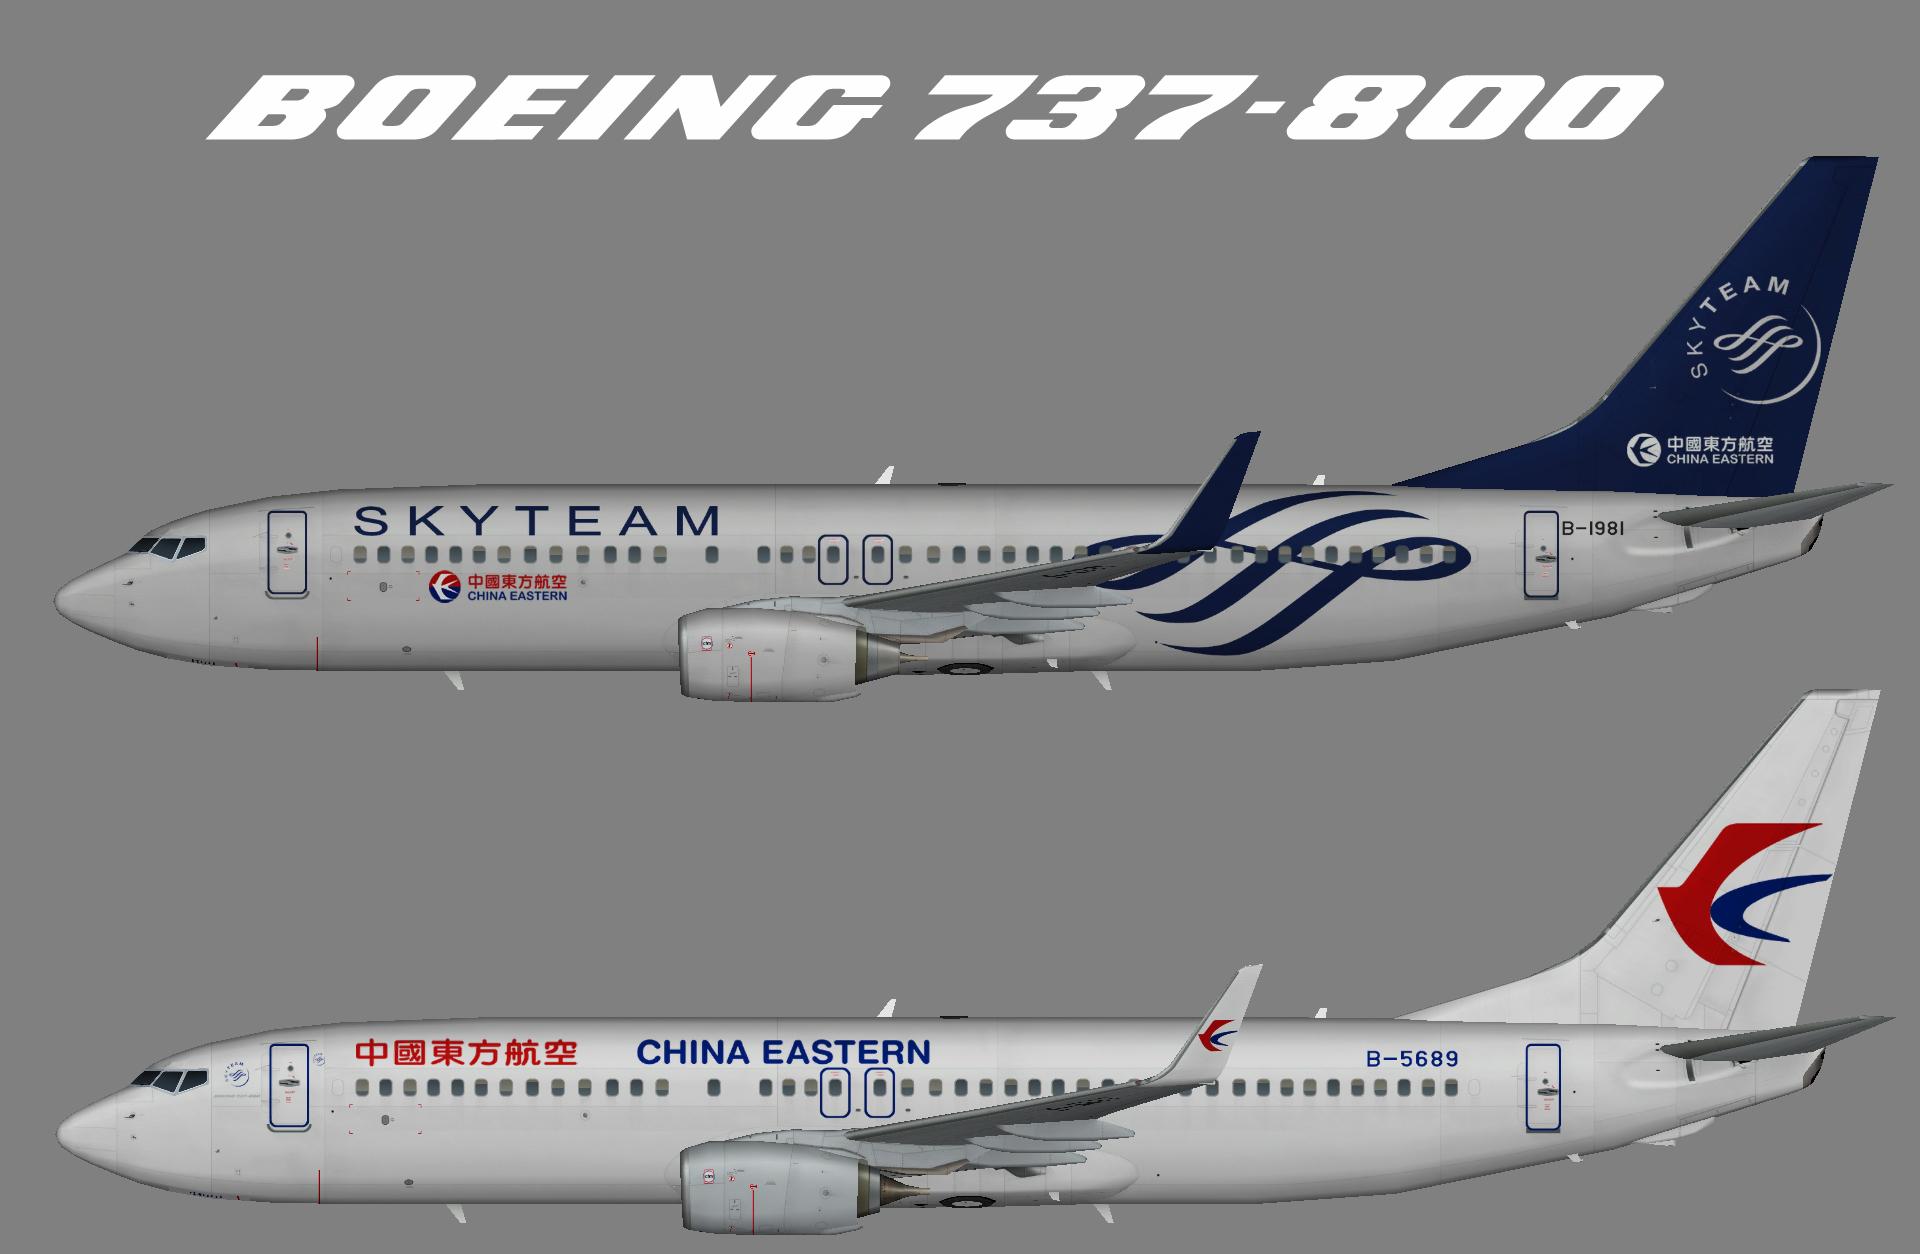 China Eastern Boeing 737-800w – Juergen's paint hangar